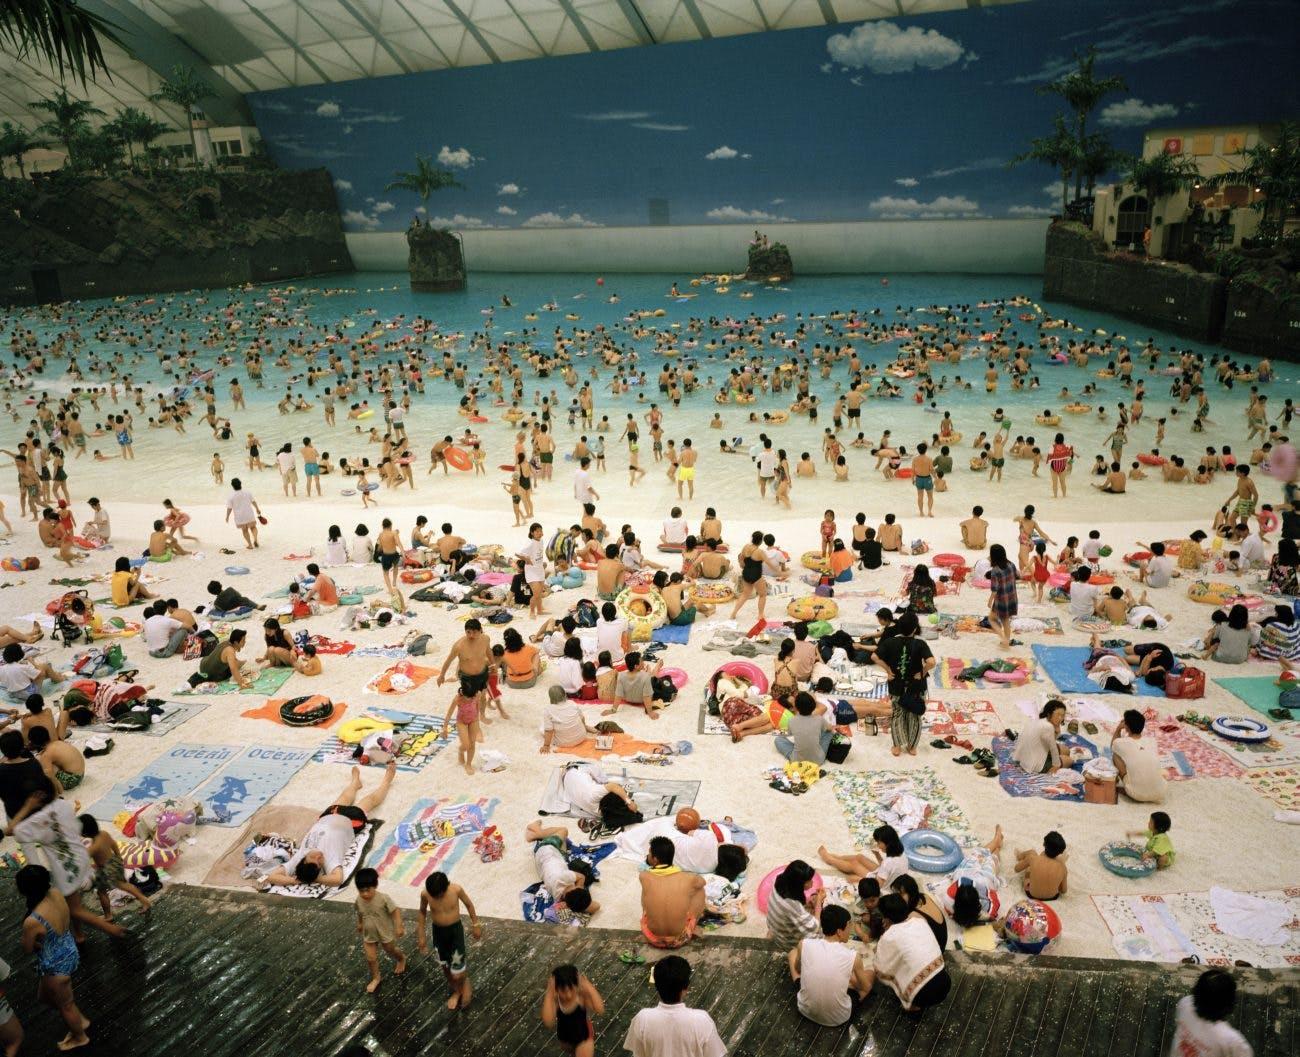 Mer artificielle sous un dome, Miyazaki, Japon (1996)